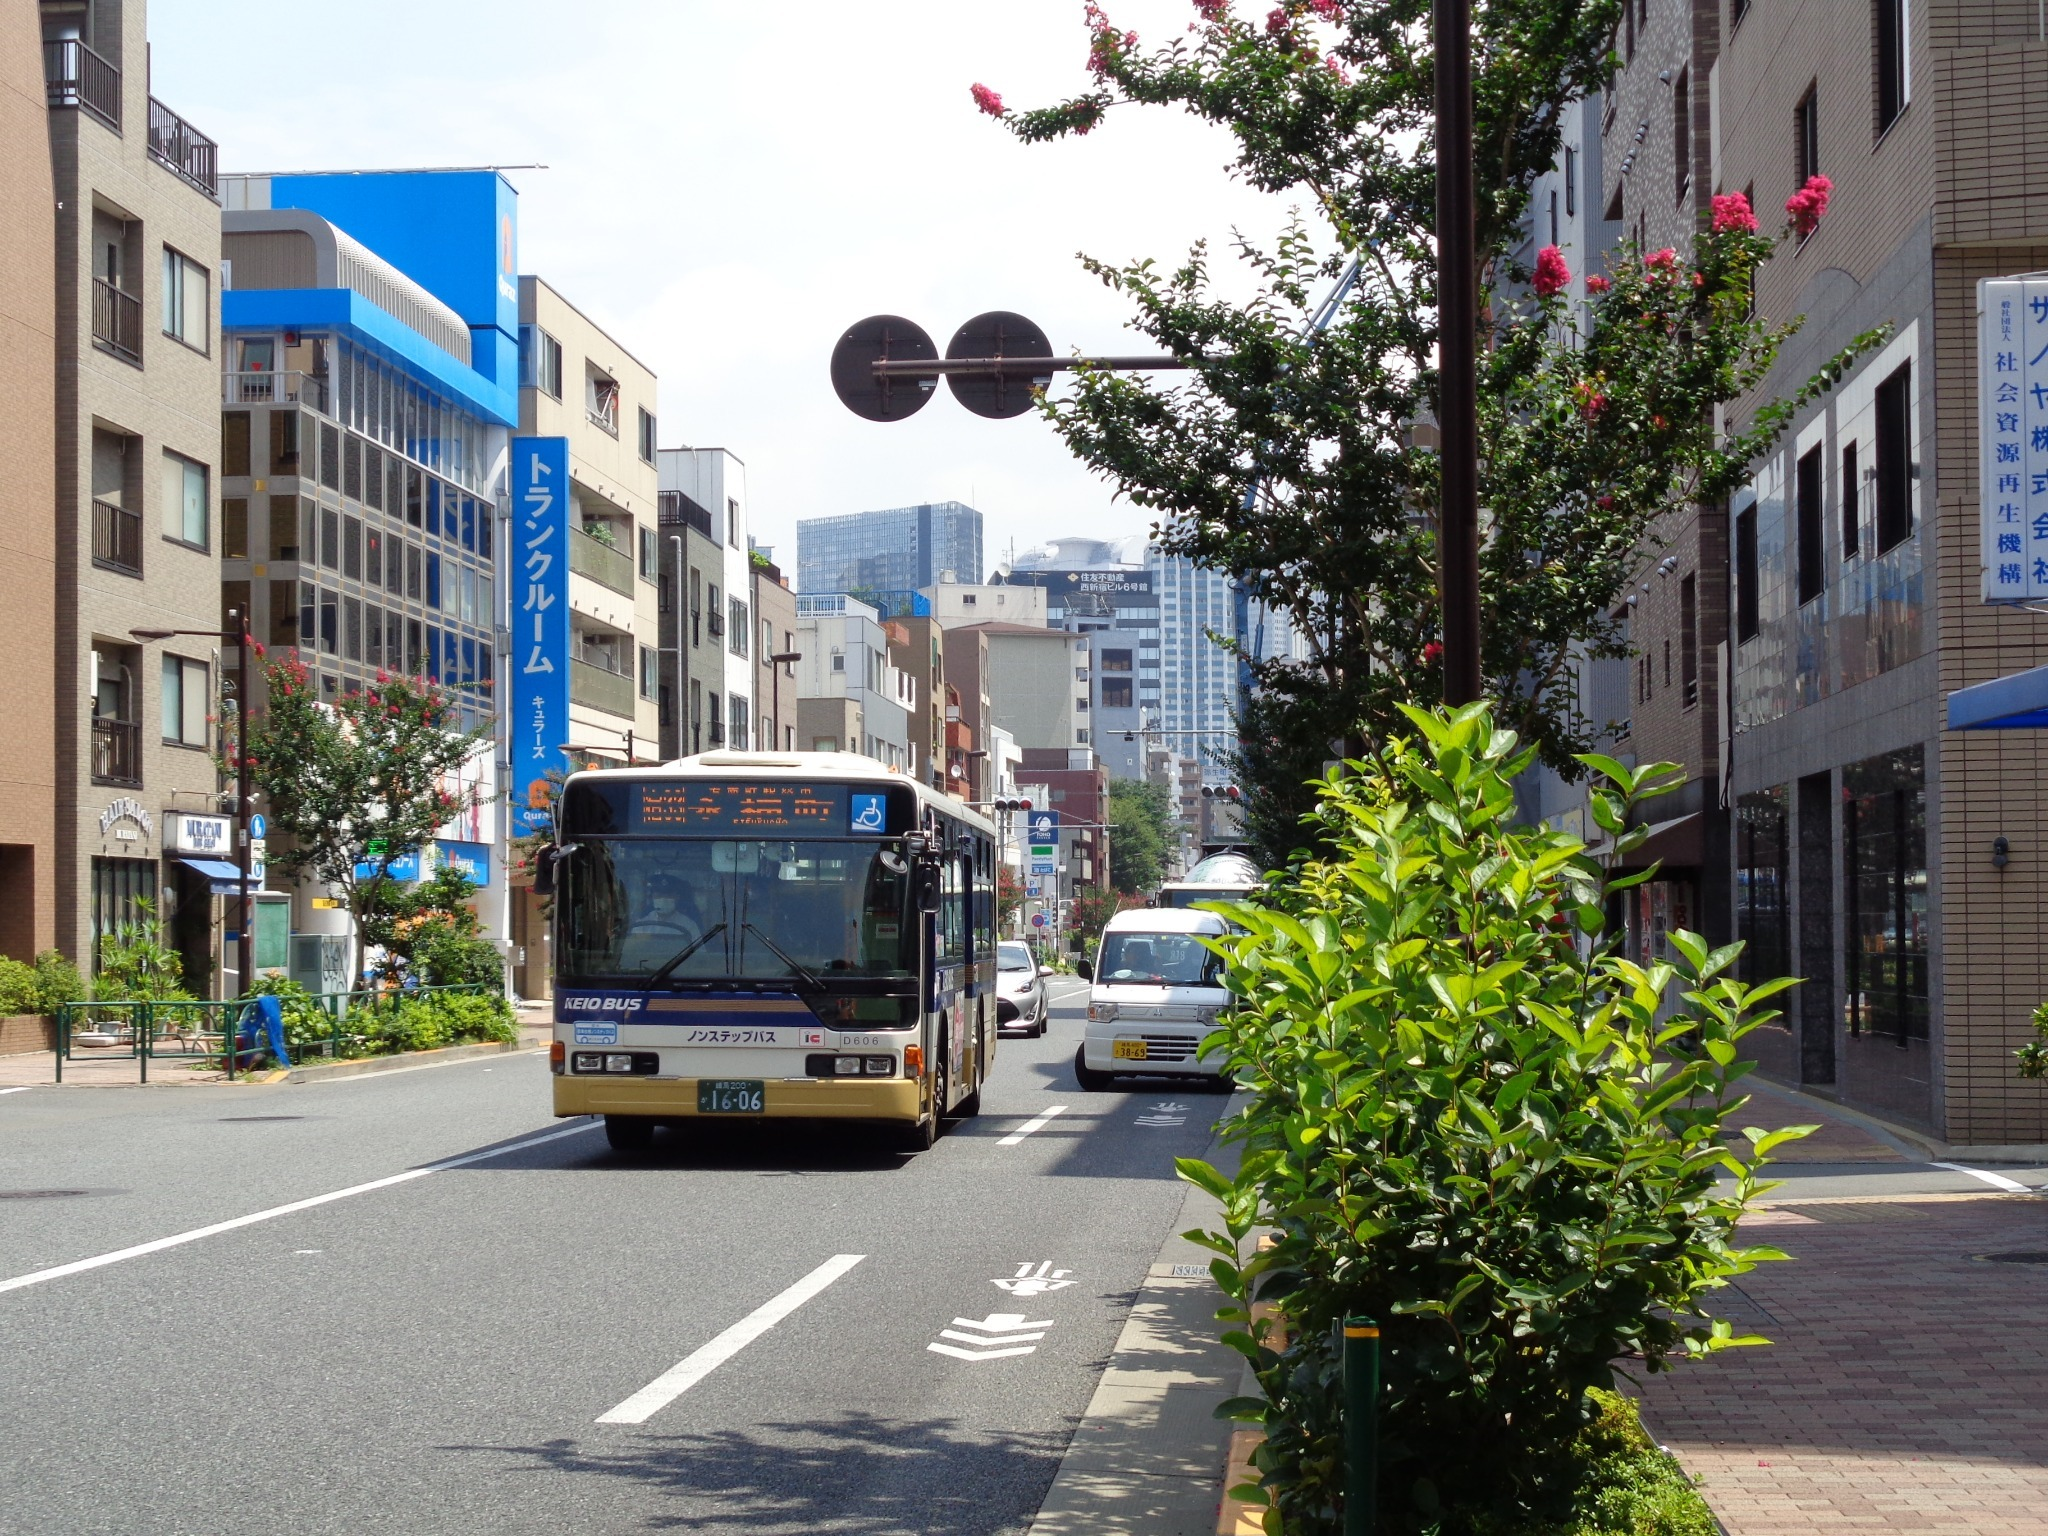 近隣風景 Neighborhood scenery